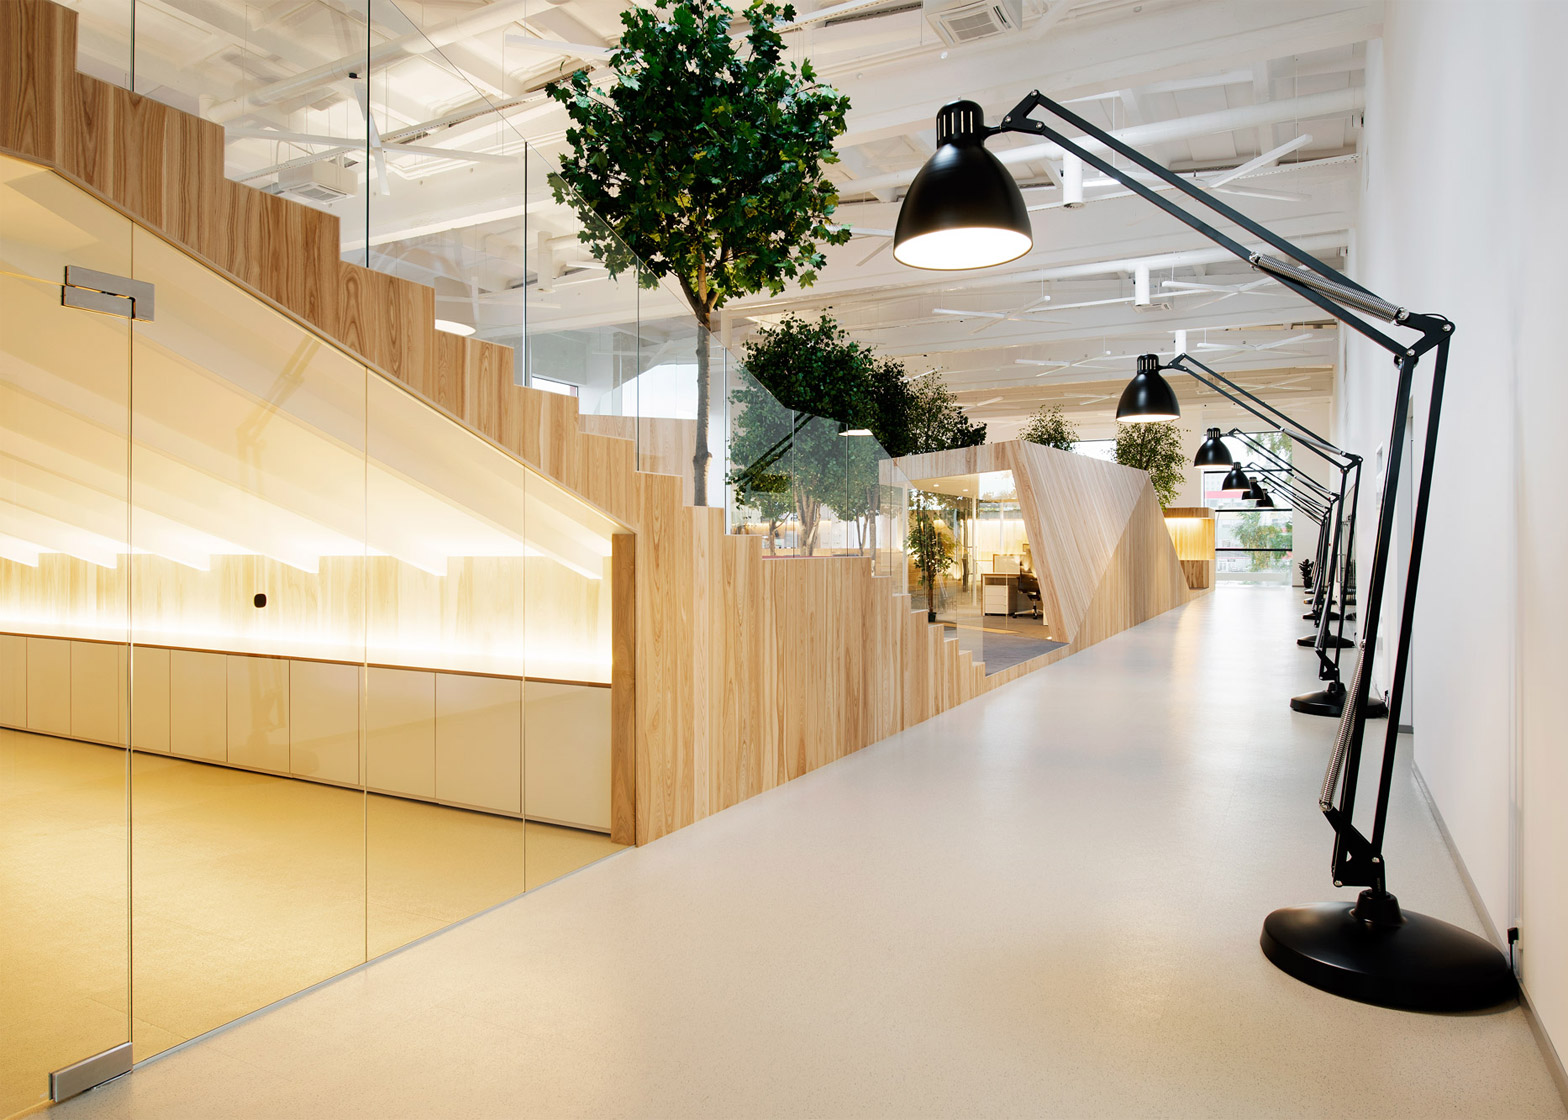 Office-Lenne_Estonia_KAMP-Arhitektid_dezeen_1568_6